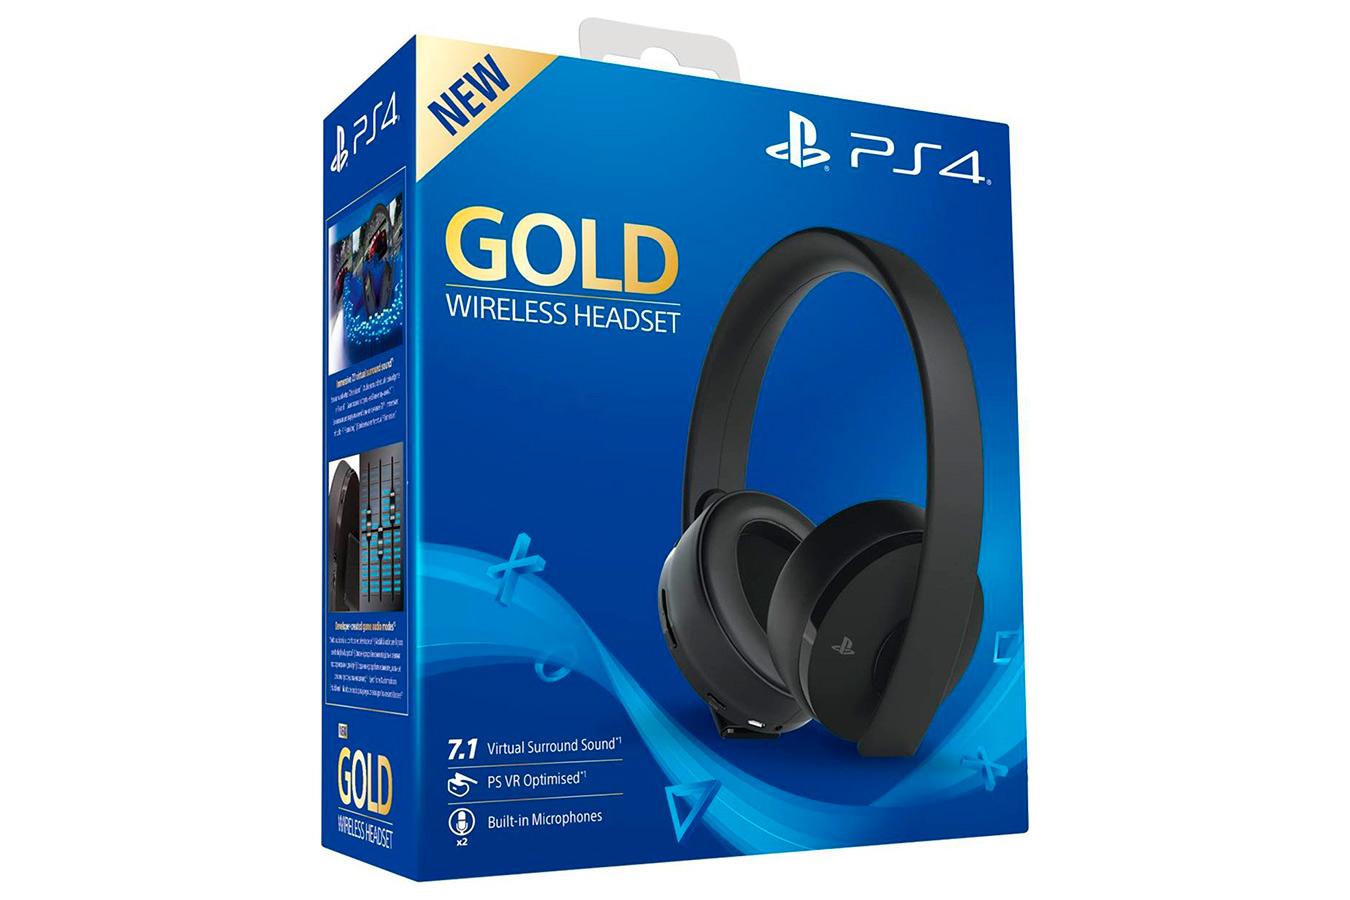 Sony Wireless Headset Gold беспроводная гарнитура [PS4SHGO]